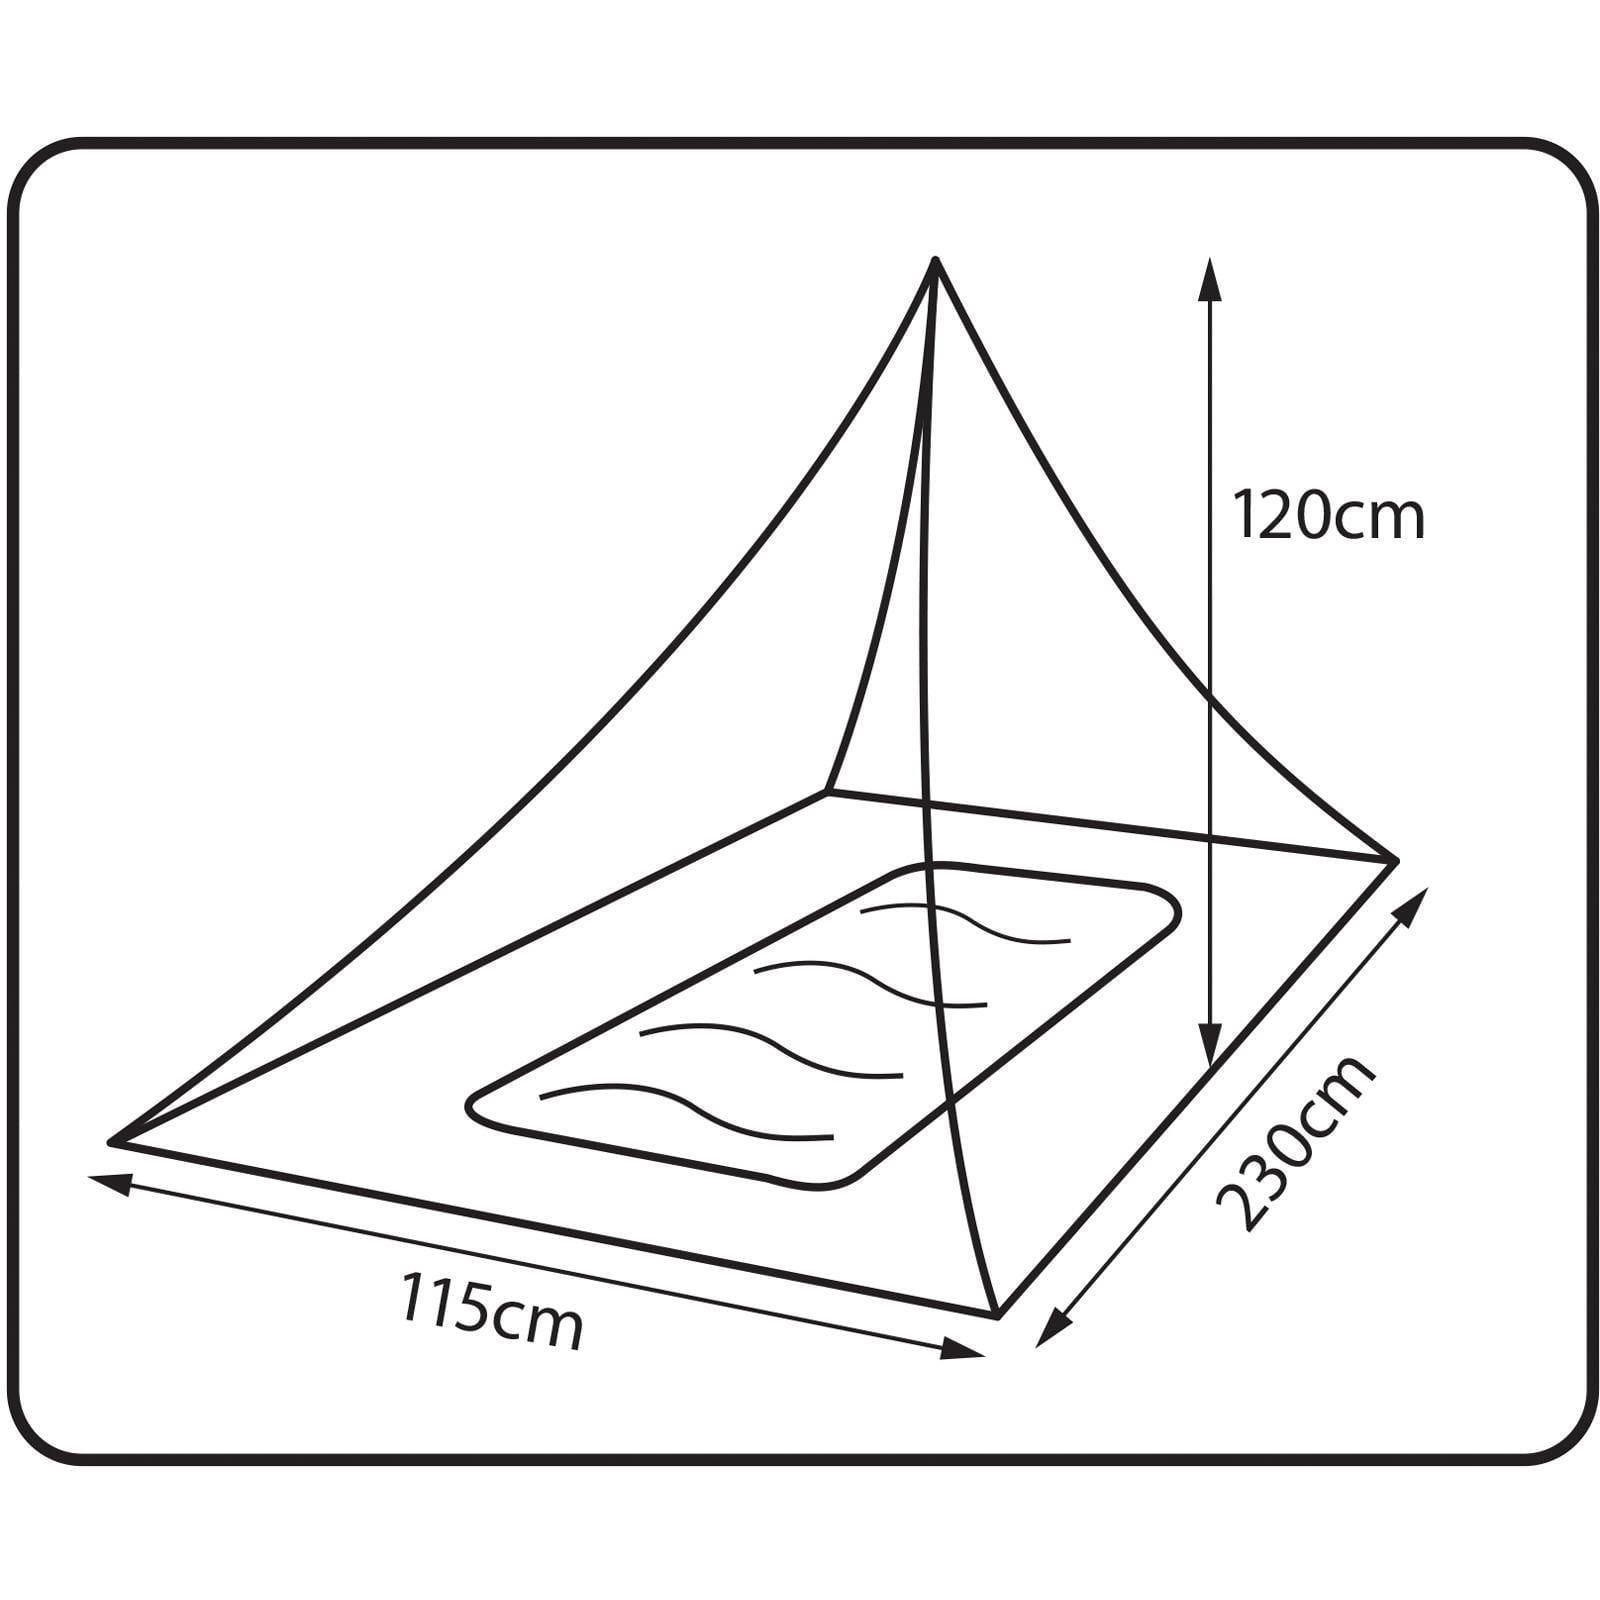 360° degrees Insect Net Single - Moskito-Netz - Bild 2